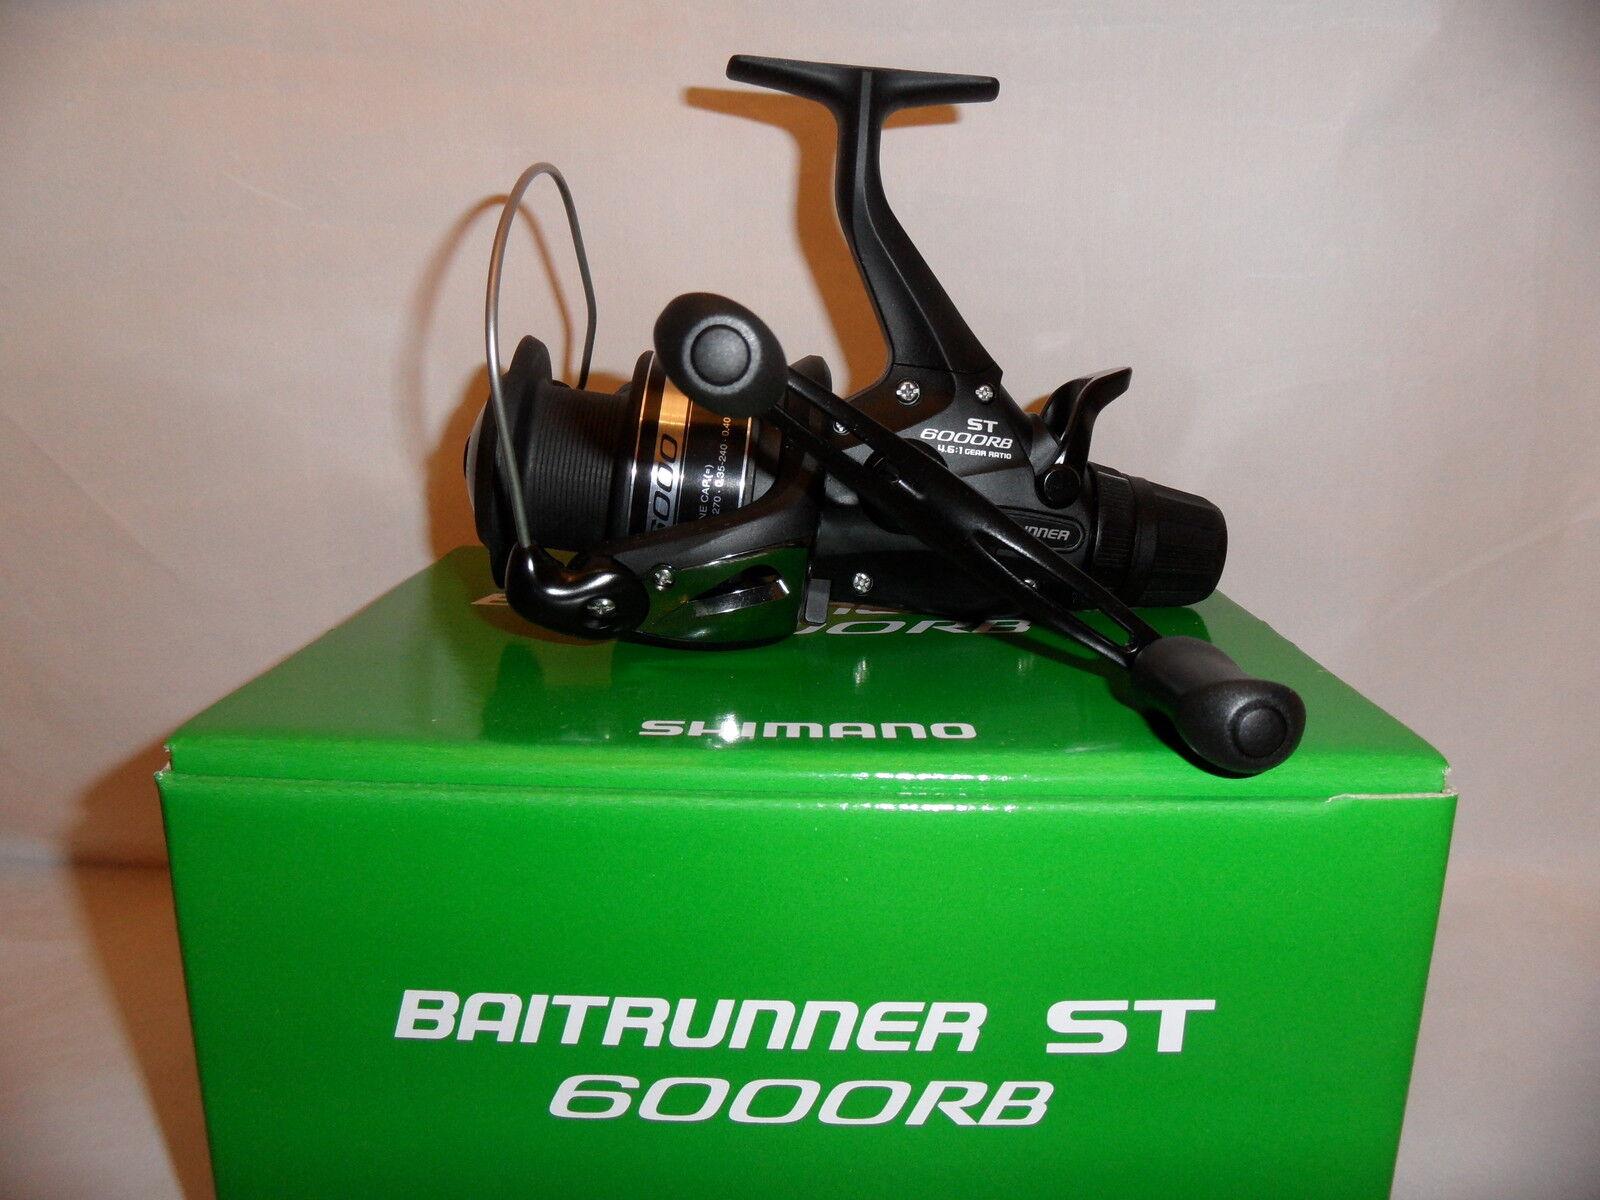 Shiuomoo BAITcorrereNER ST 6000RB  nuovo